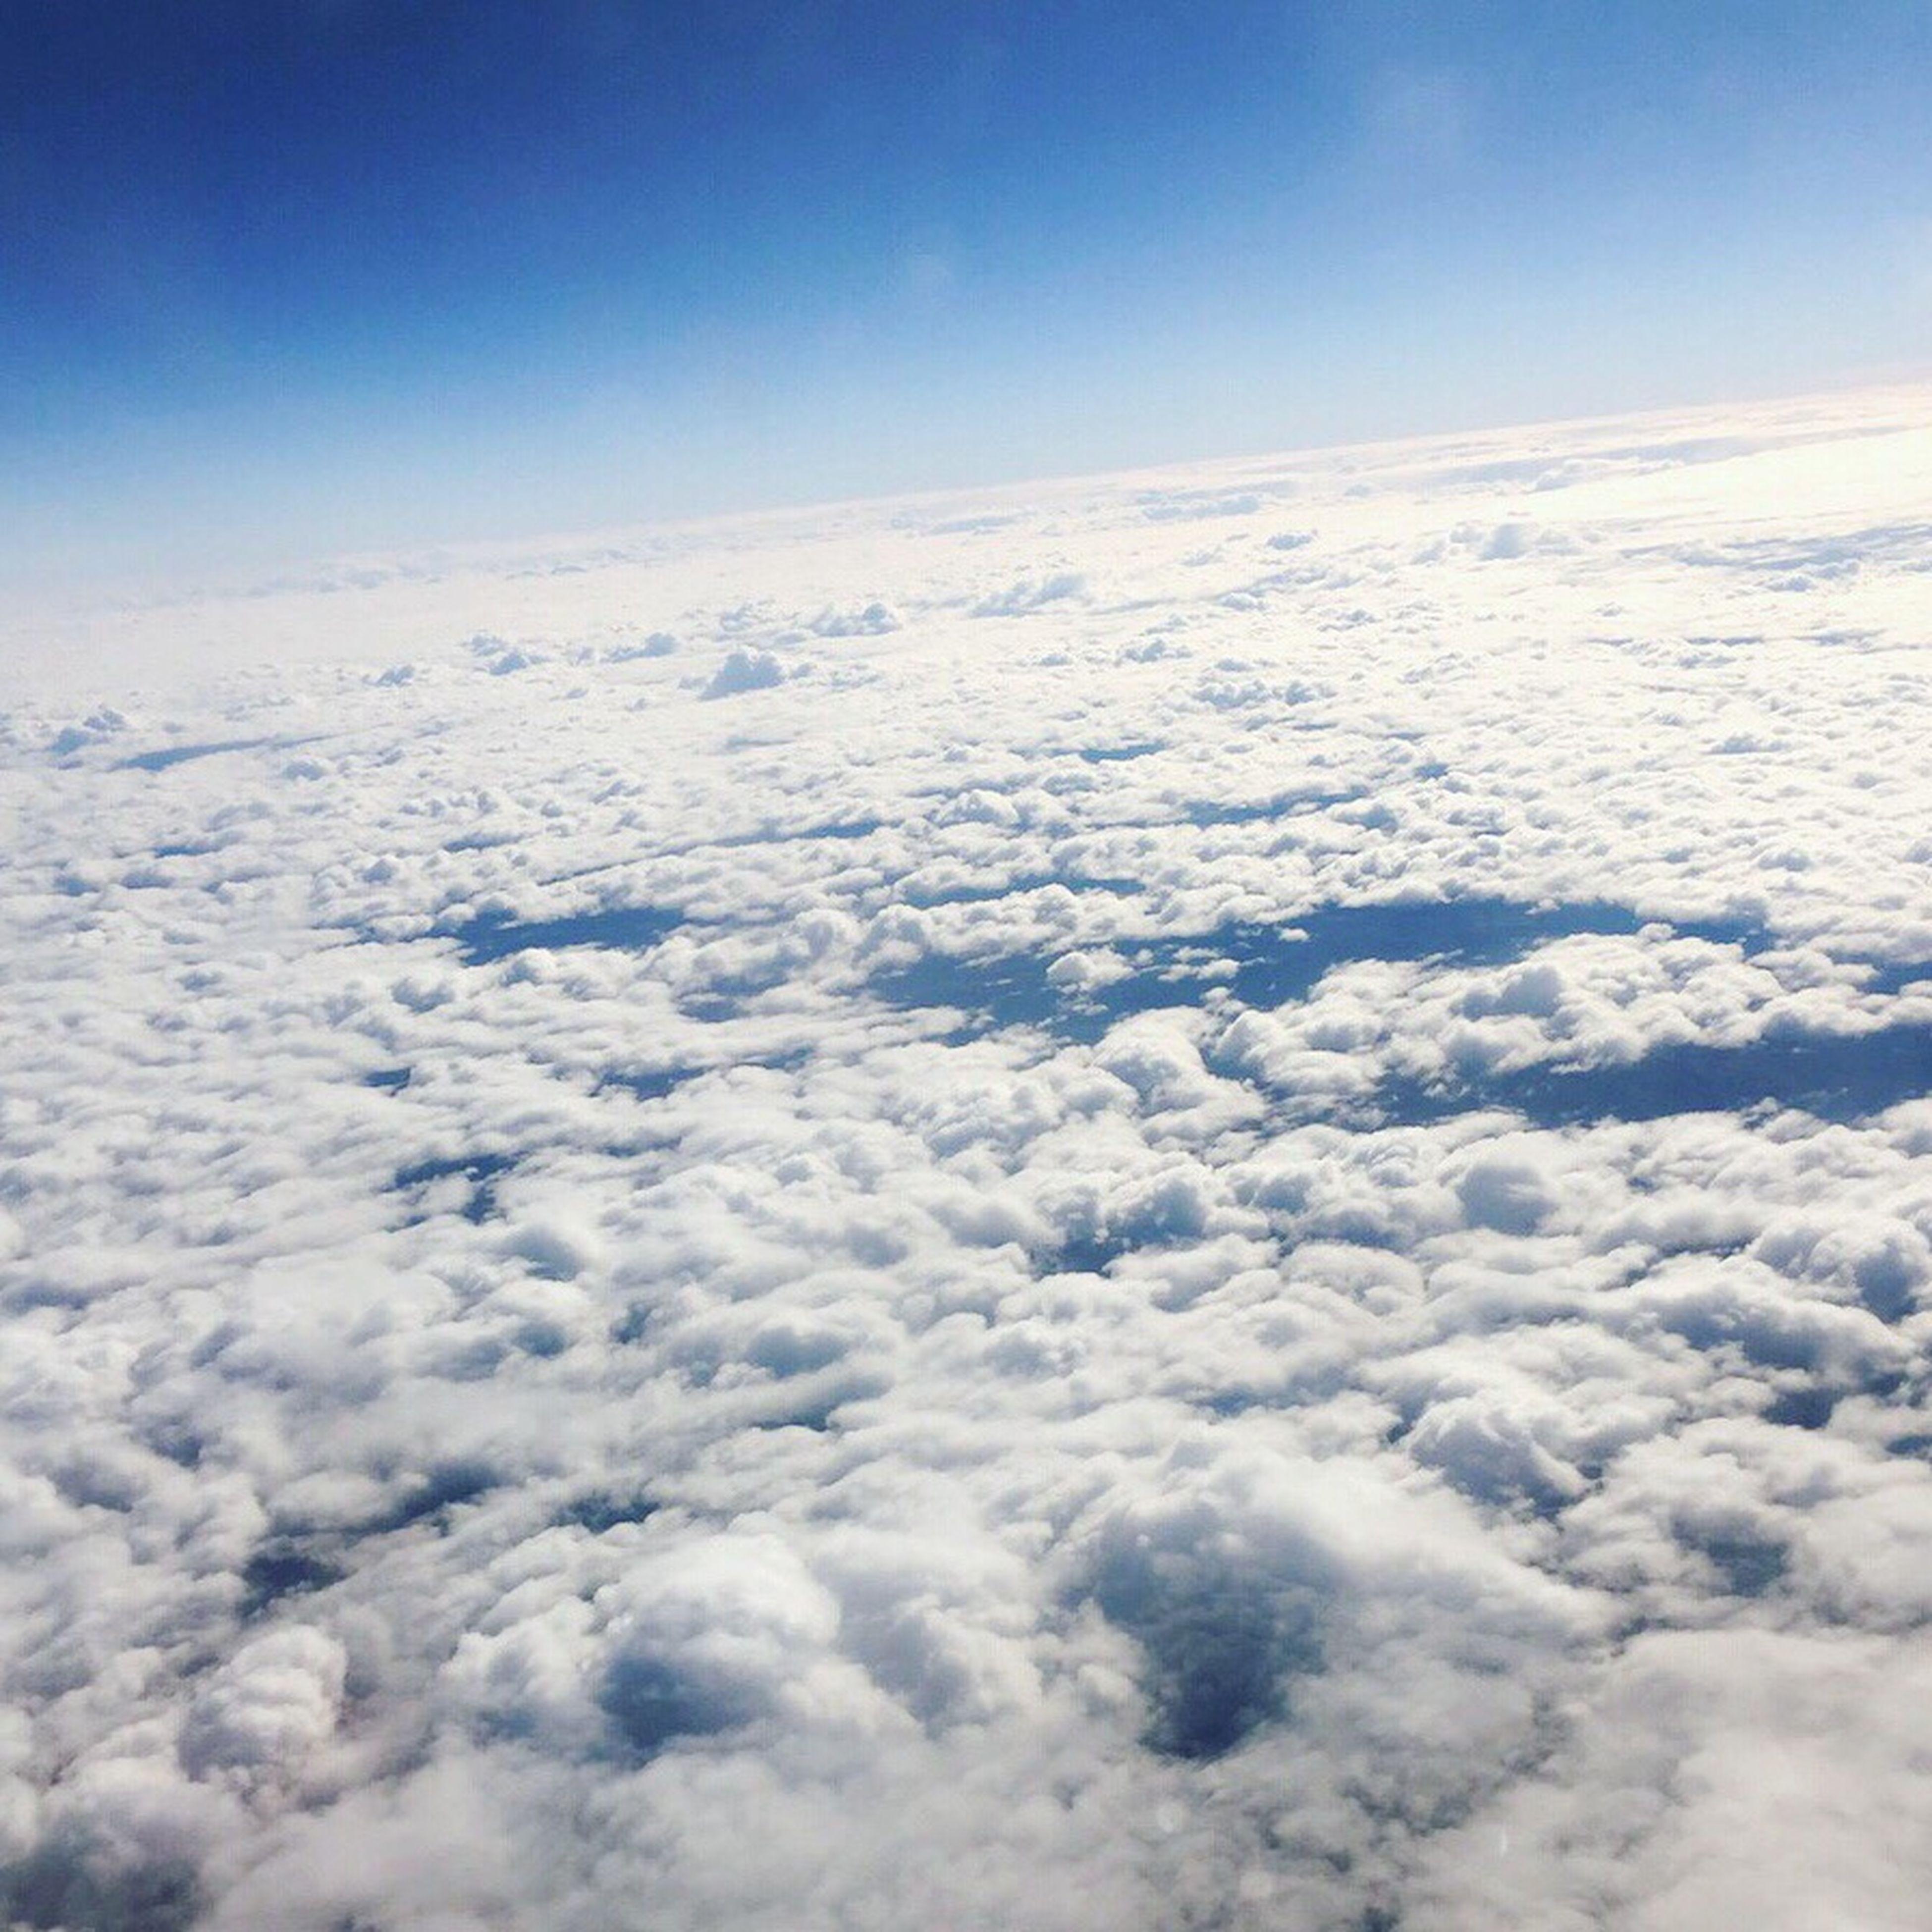 Sky Blue Cloud - Sky The Natural World небо небоизсамолета небо облака небо и облака